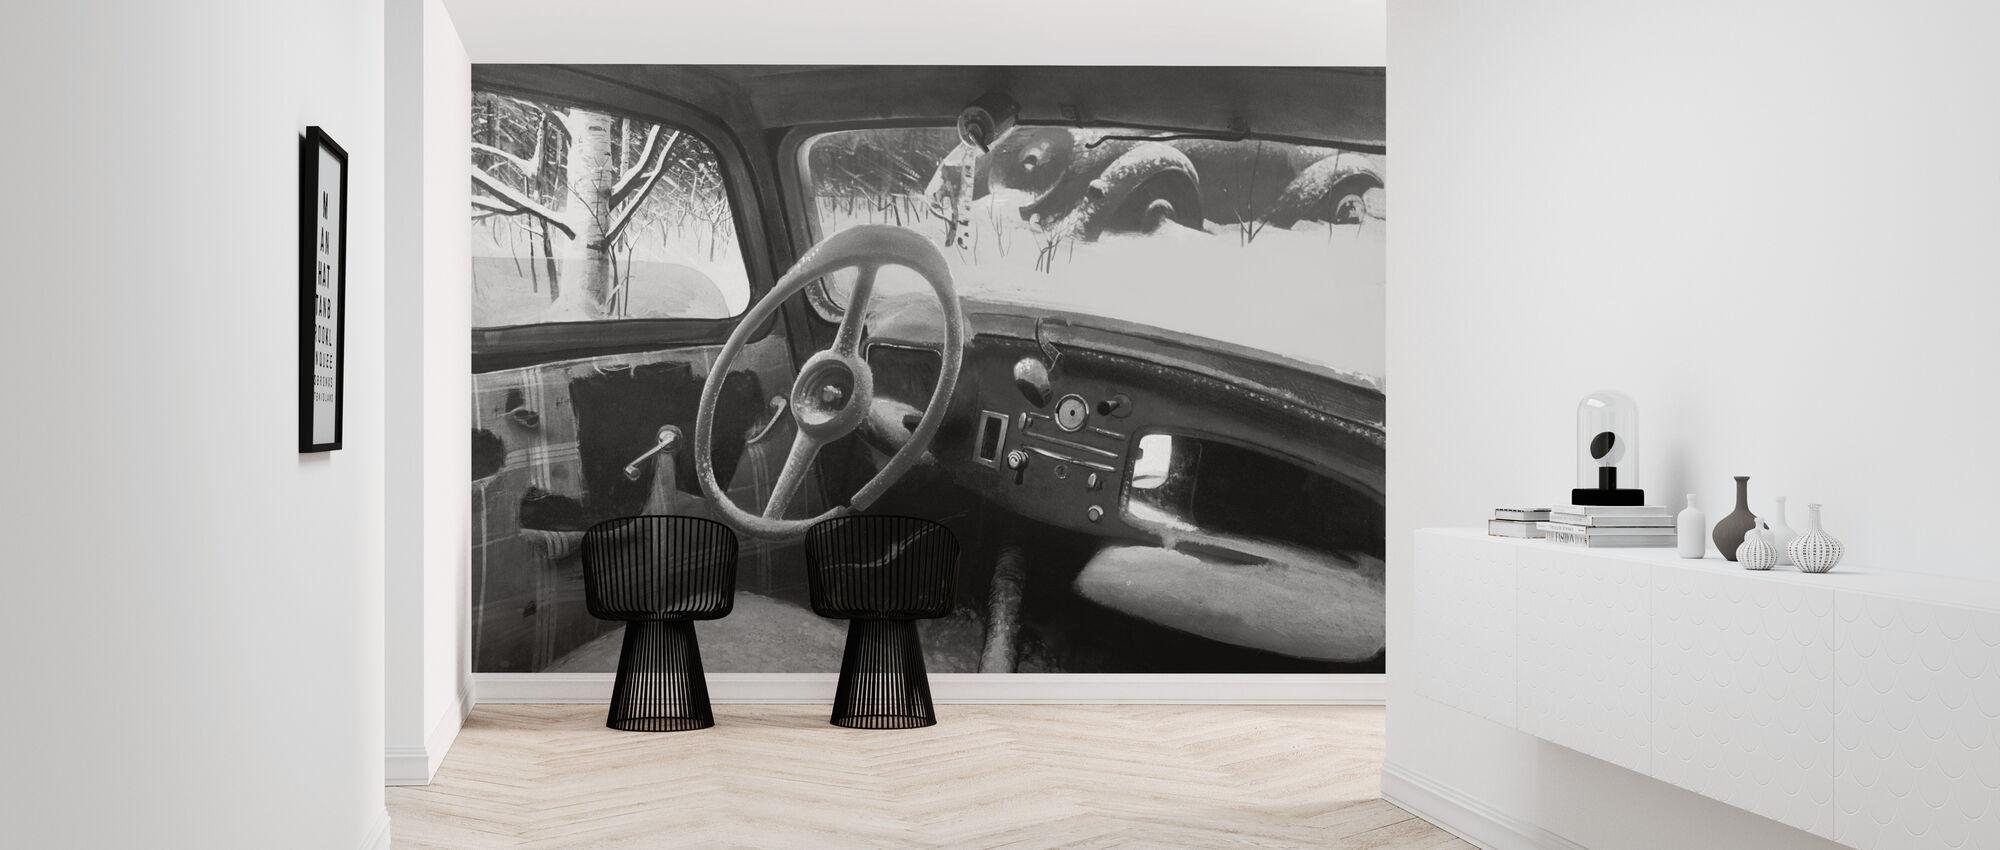 B11 Steering Wheel BW - Wallpaper - Hallway